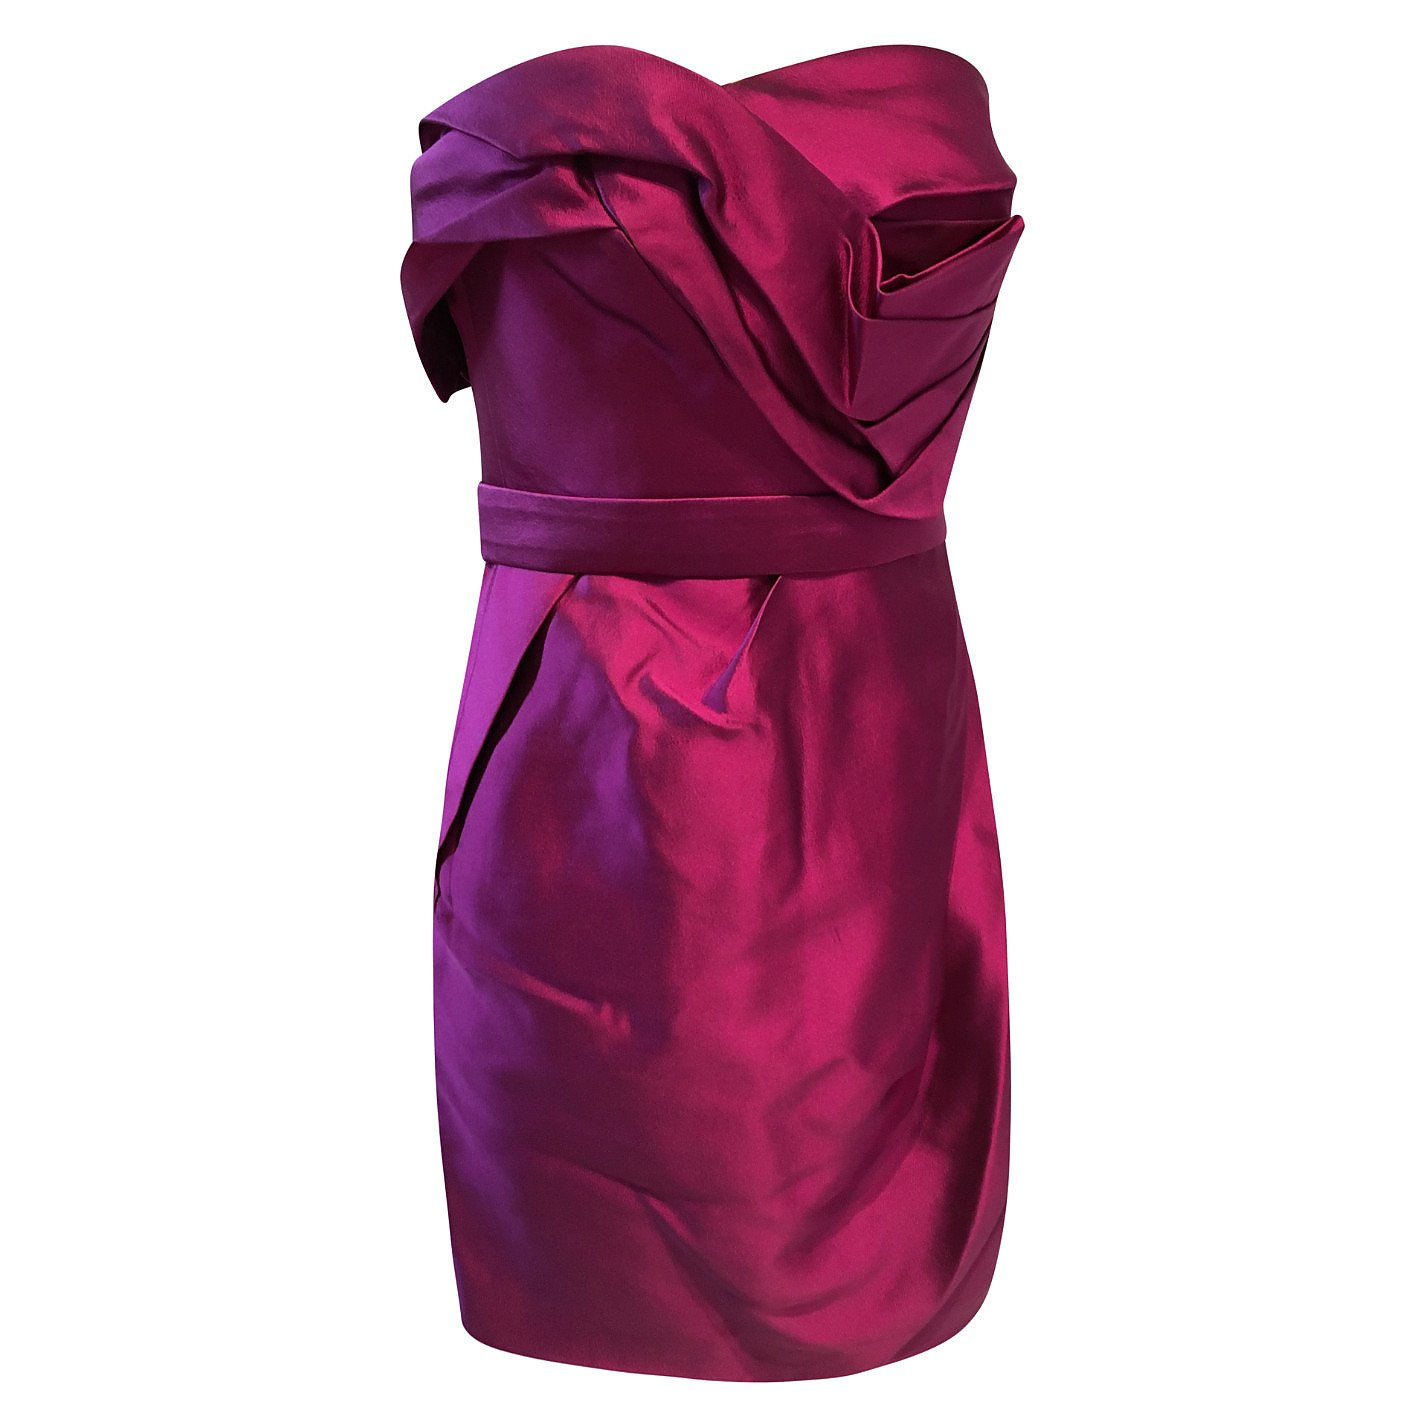 Marchesa Couture Structured Satin Mini Dress